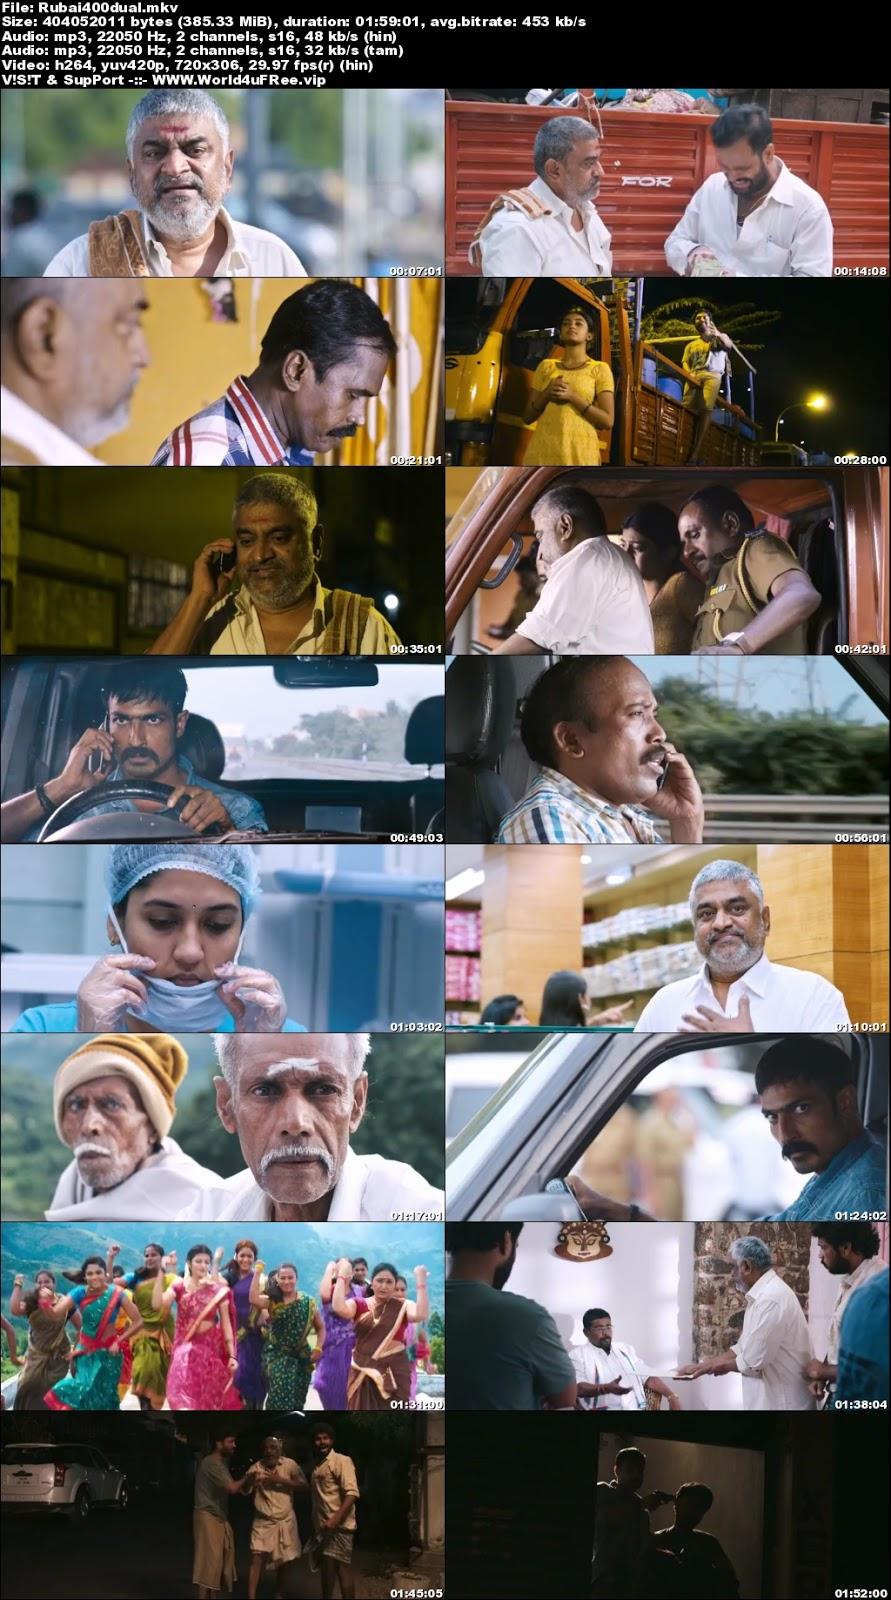 Rubaai 2017 Dual Audio UNCUT HDRip 480p 400Mb x264 world4ufree.vip , South indian movie Rubaai 2017 hindi dubbed world4ufree.vip 720p hdrip webrip dvdrip 700mb brrip bluray free download or watch online at world4ufree.vip